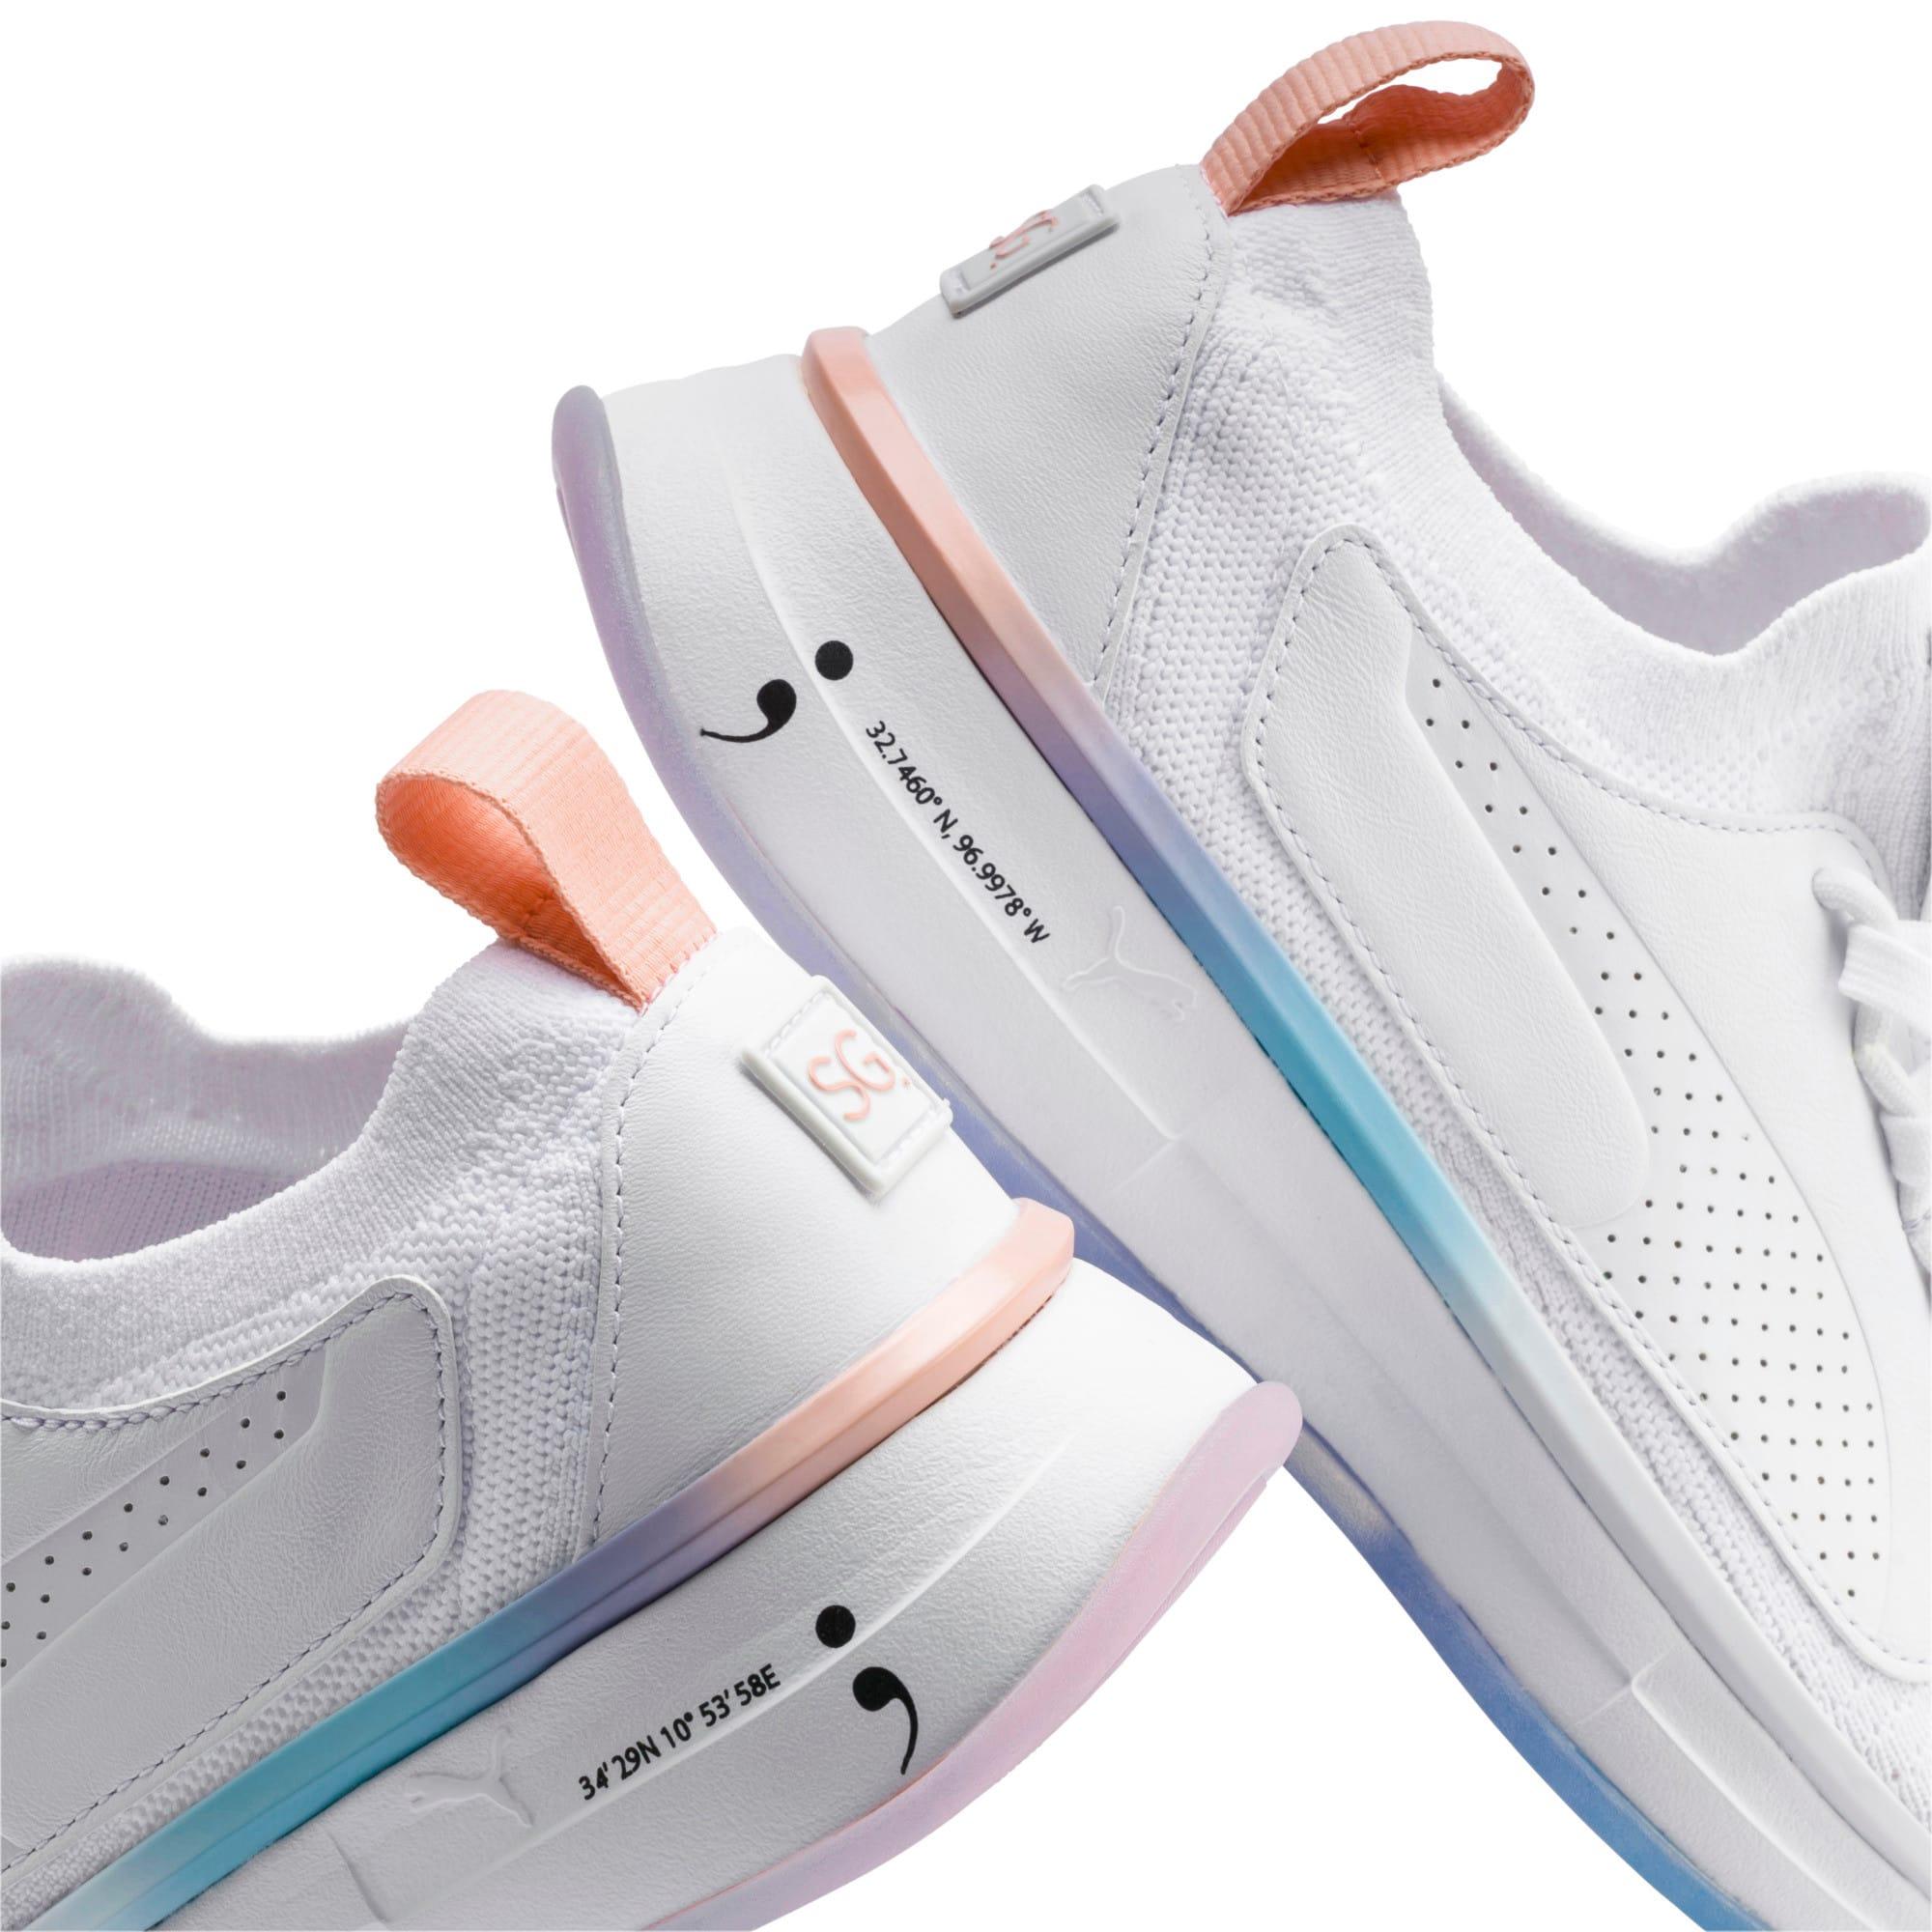 Thumbnail 8 of PUMA x SELENA GOMEZ Runner Women's Training Shoes, Puma White-Peach Bud, medium